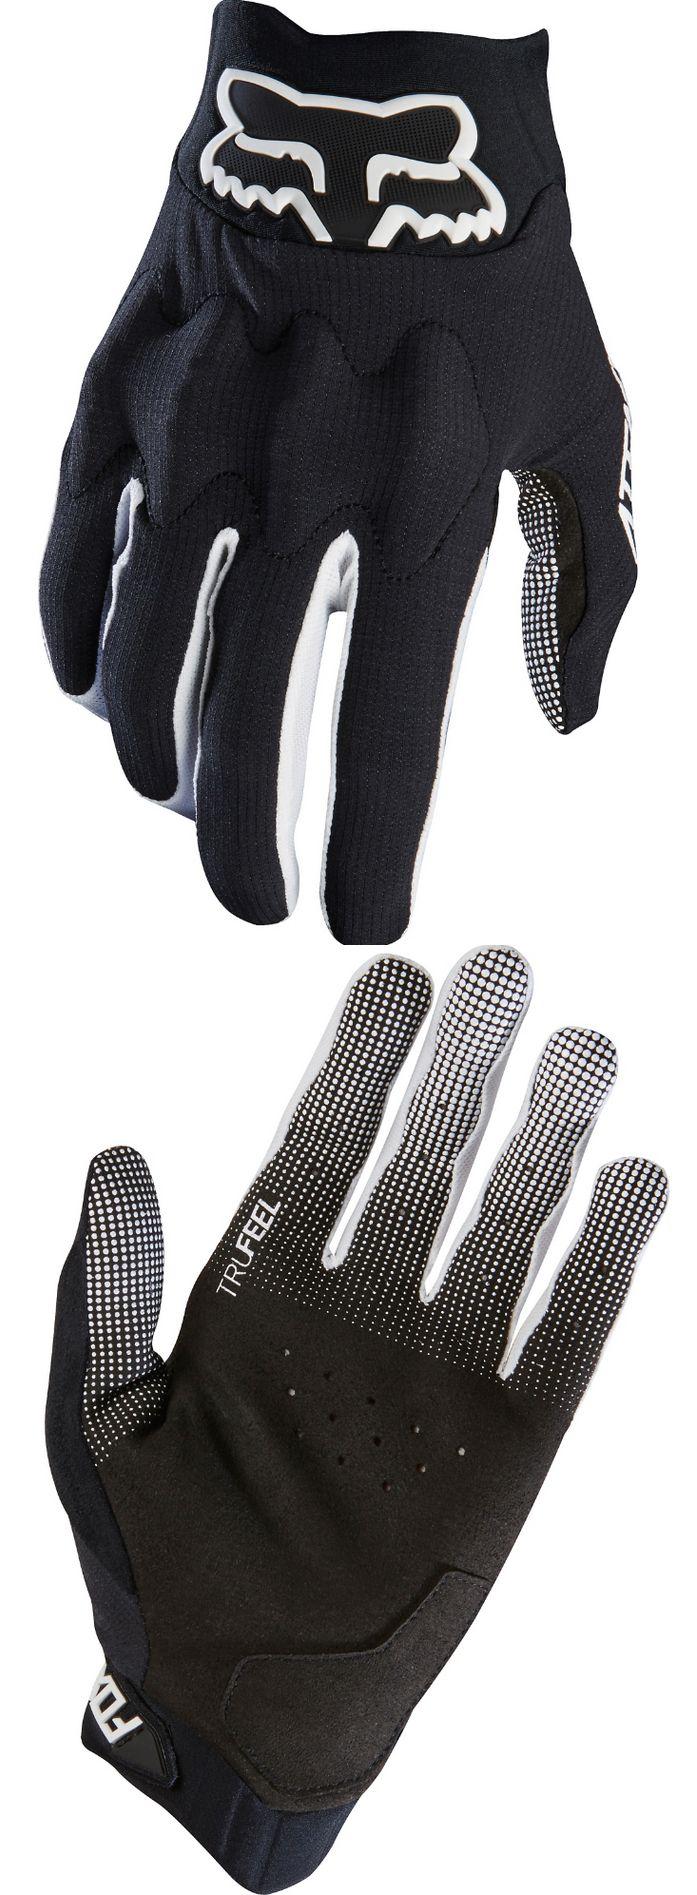 Gloves fox racing mtb mens black white attack gloves downhill